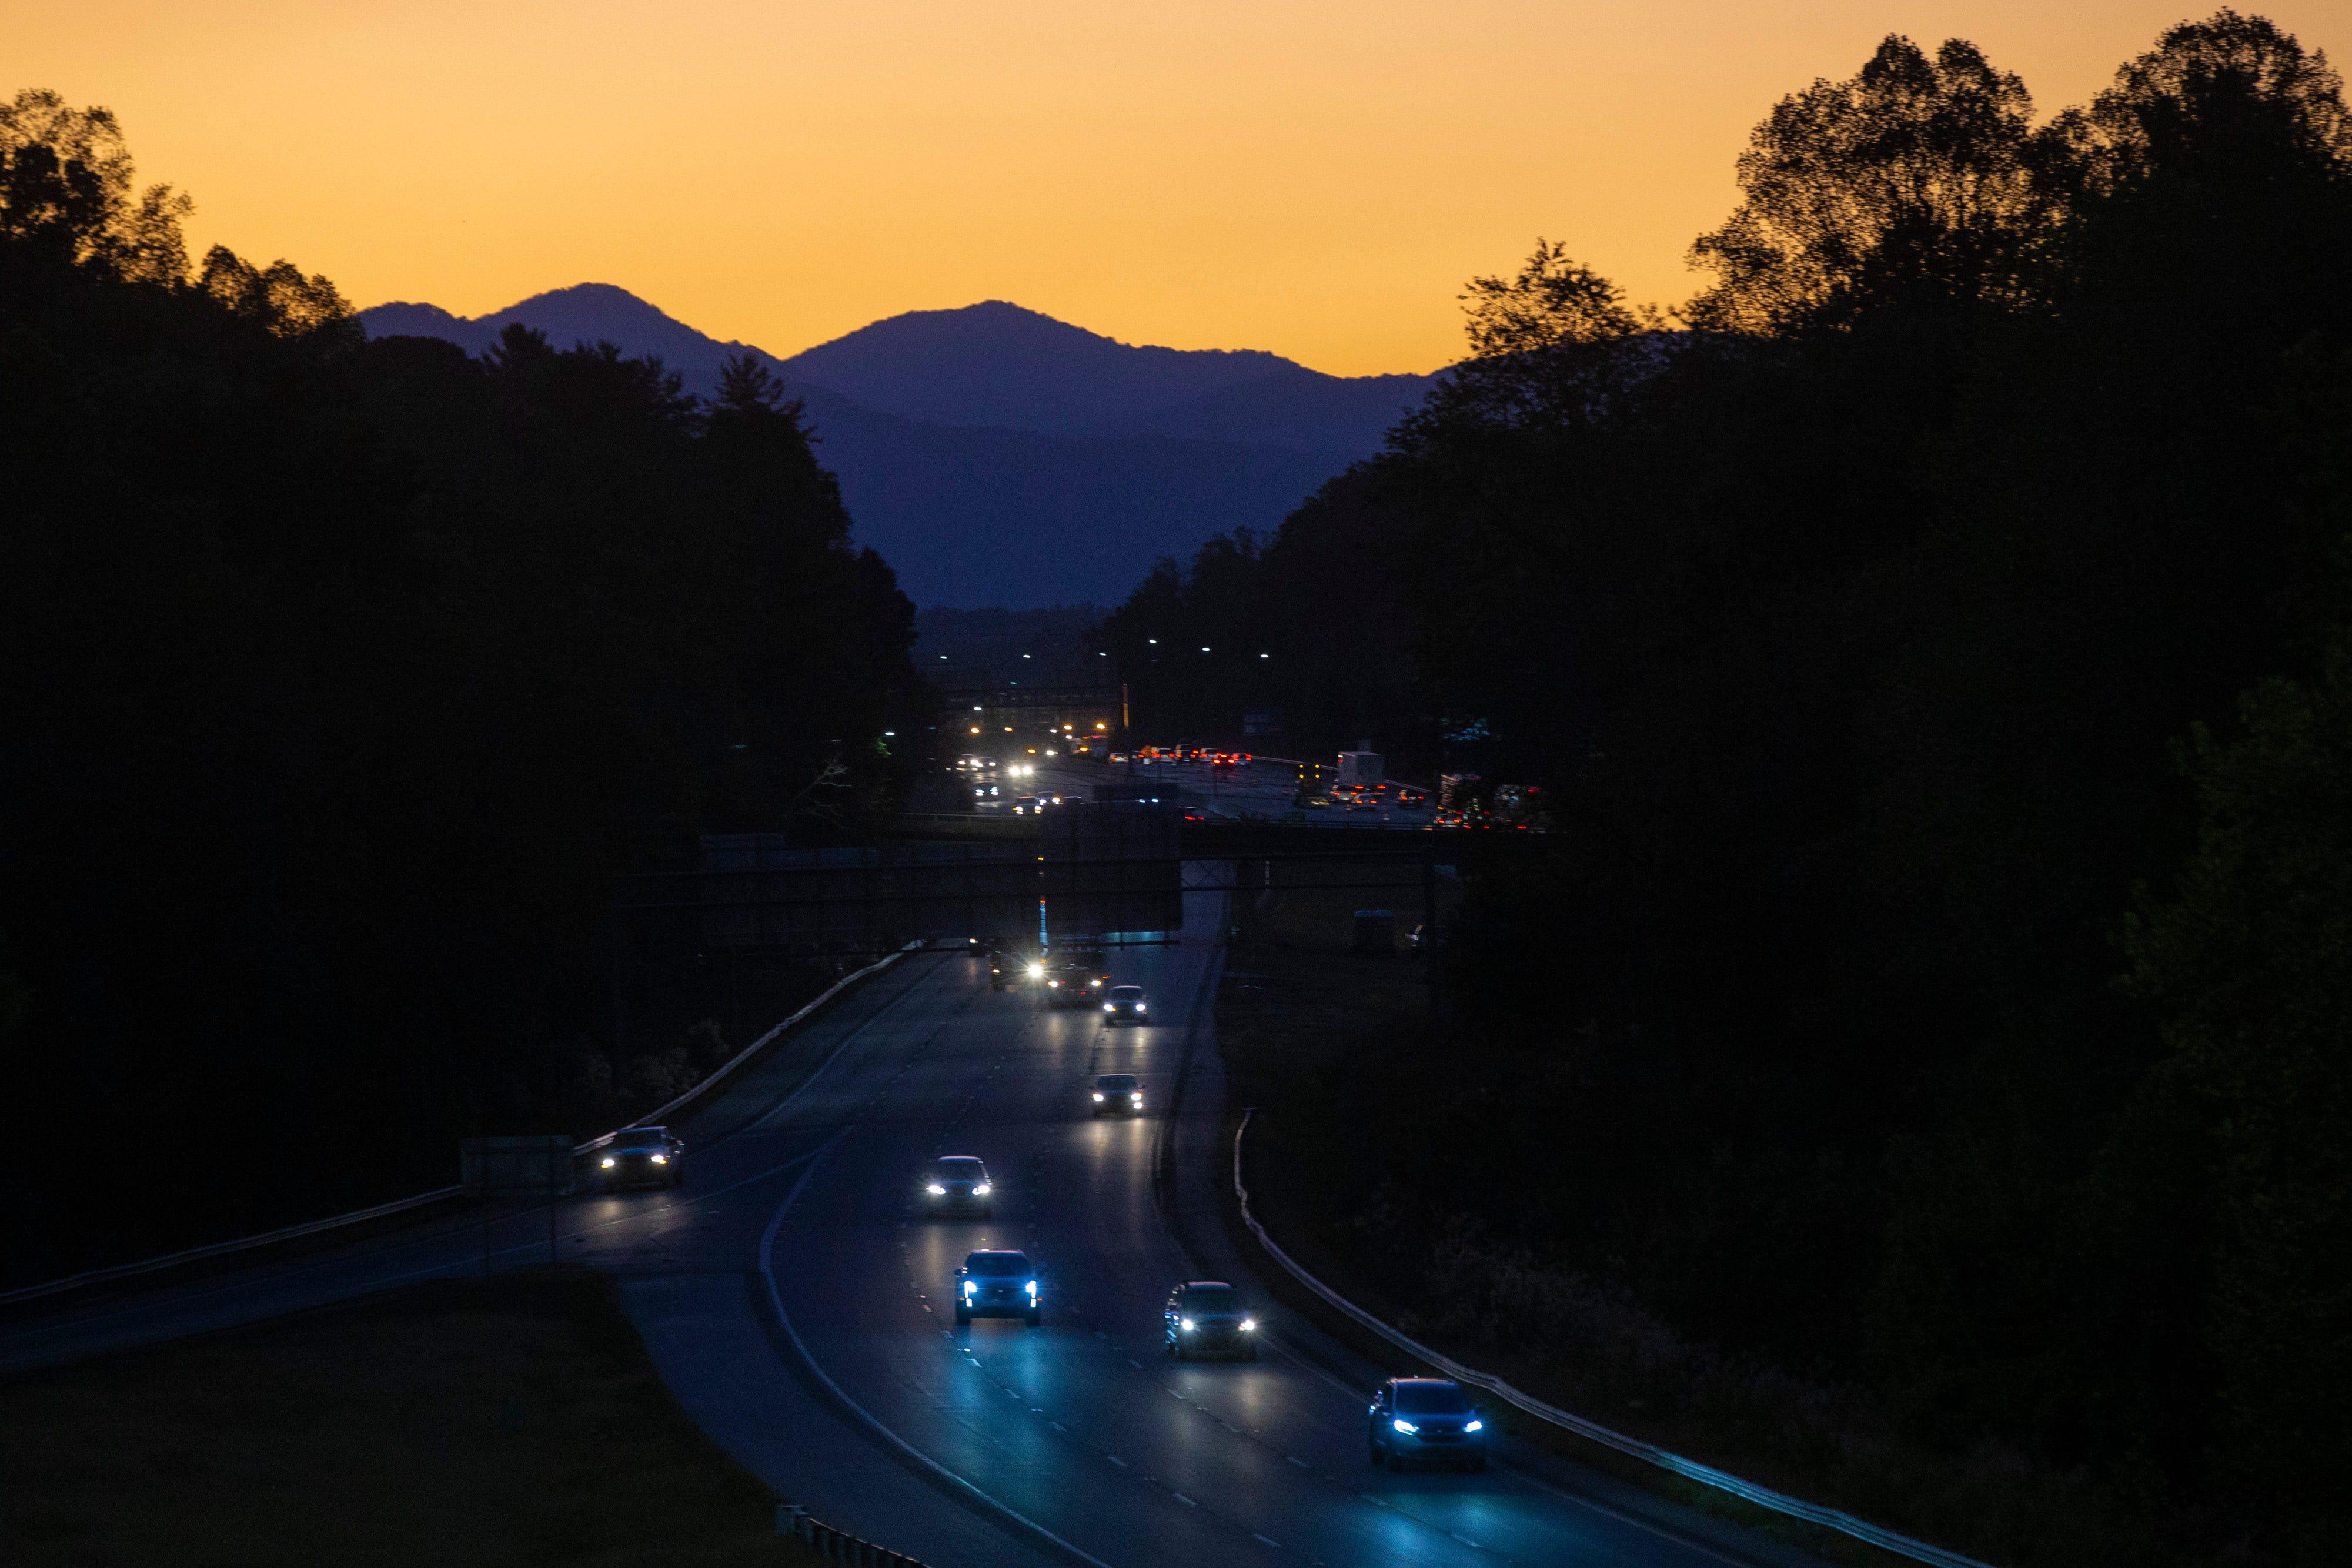 Motorists travel along US-74 in North Carolina at dusk. Oct. 3, 2019